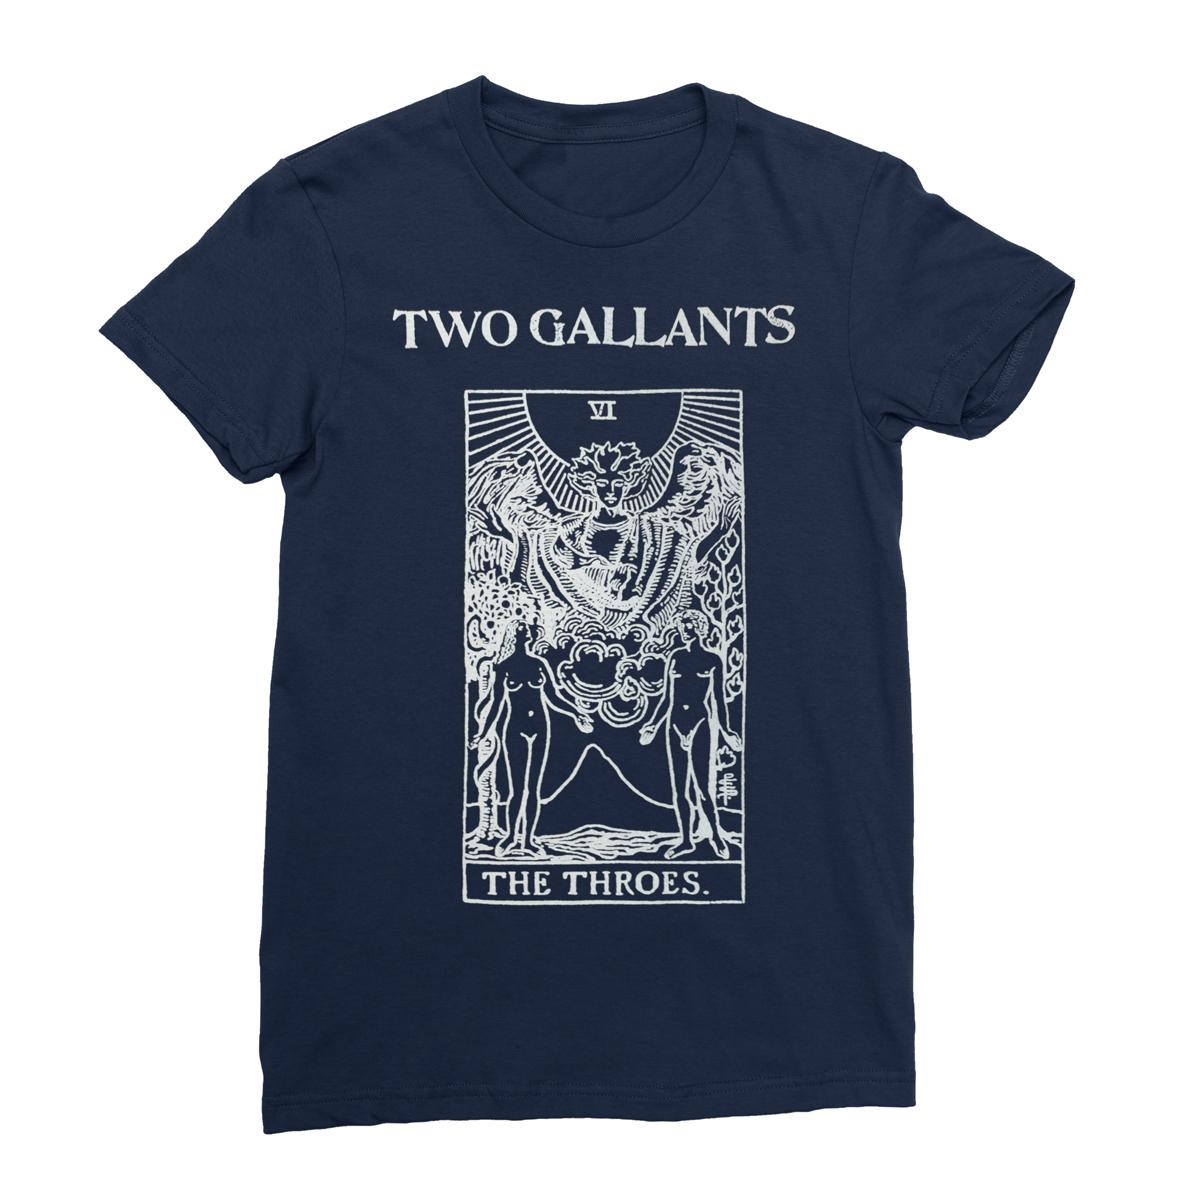 Tarot Tee - Navy - Two Gallants